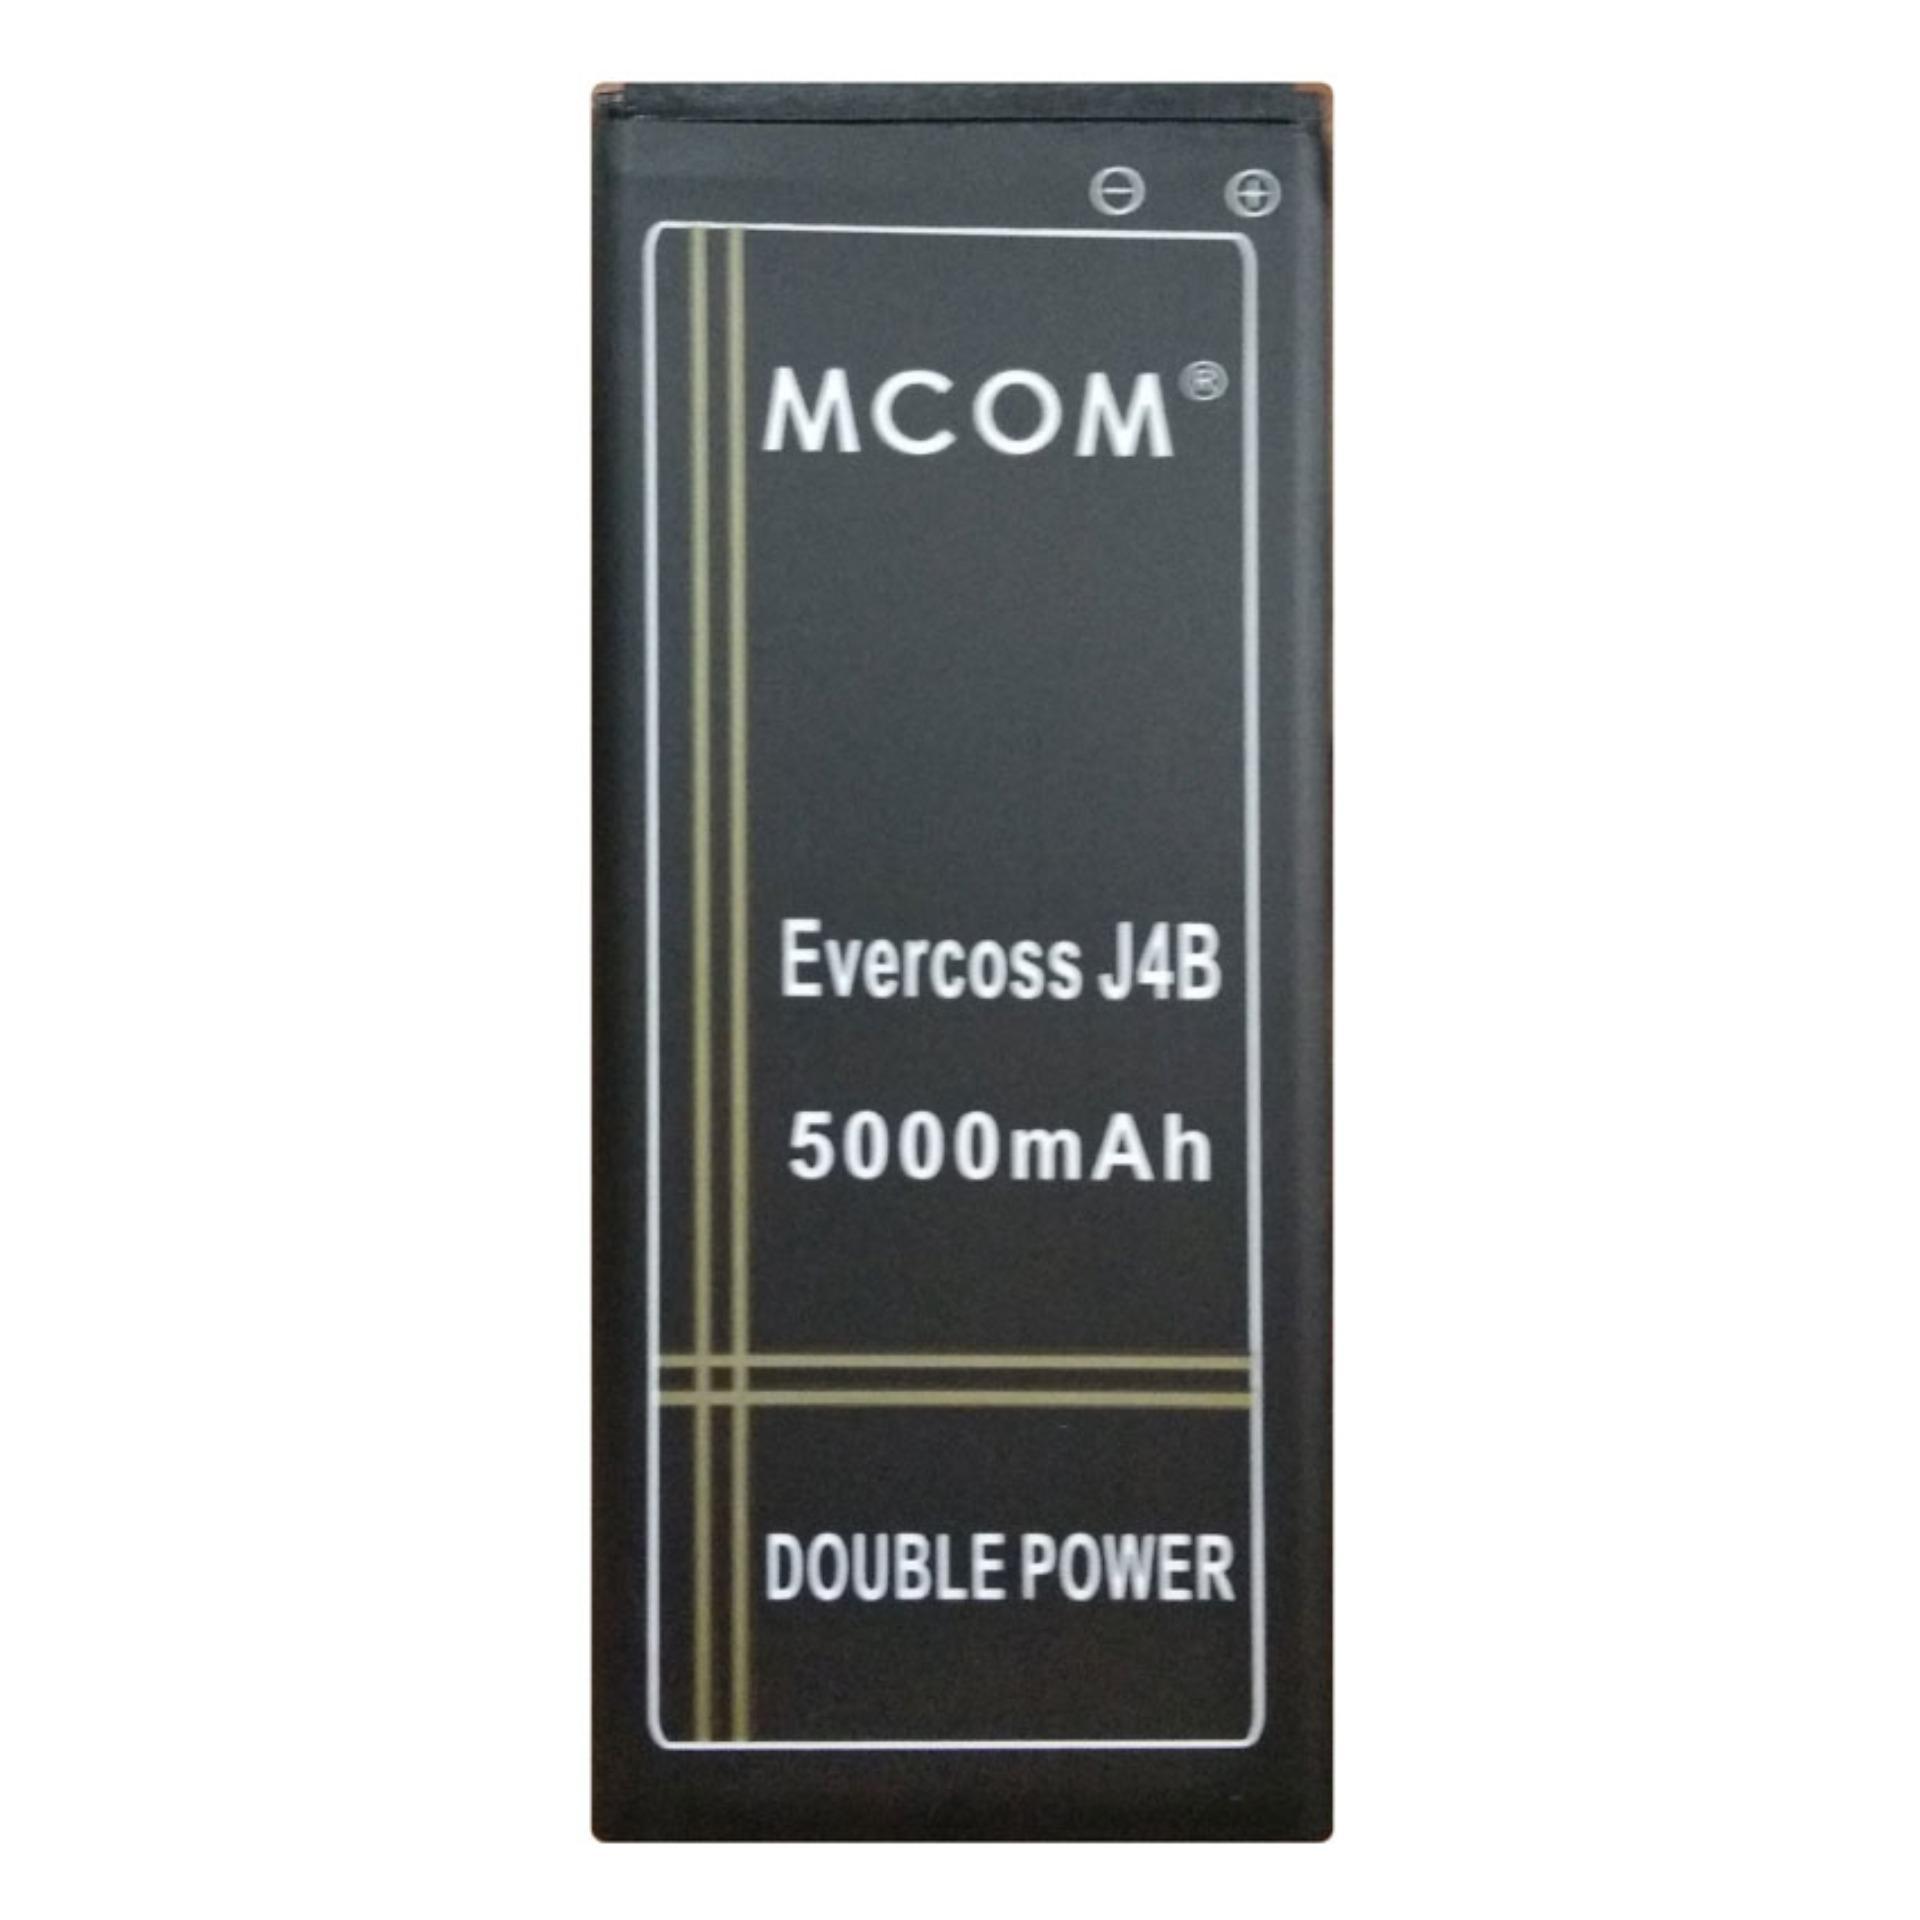 M-Com Baterai Double Power Battery for Evercoss Jump T3 Lite / J4B - 5000 mAh